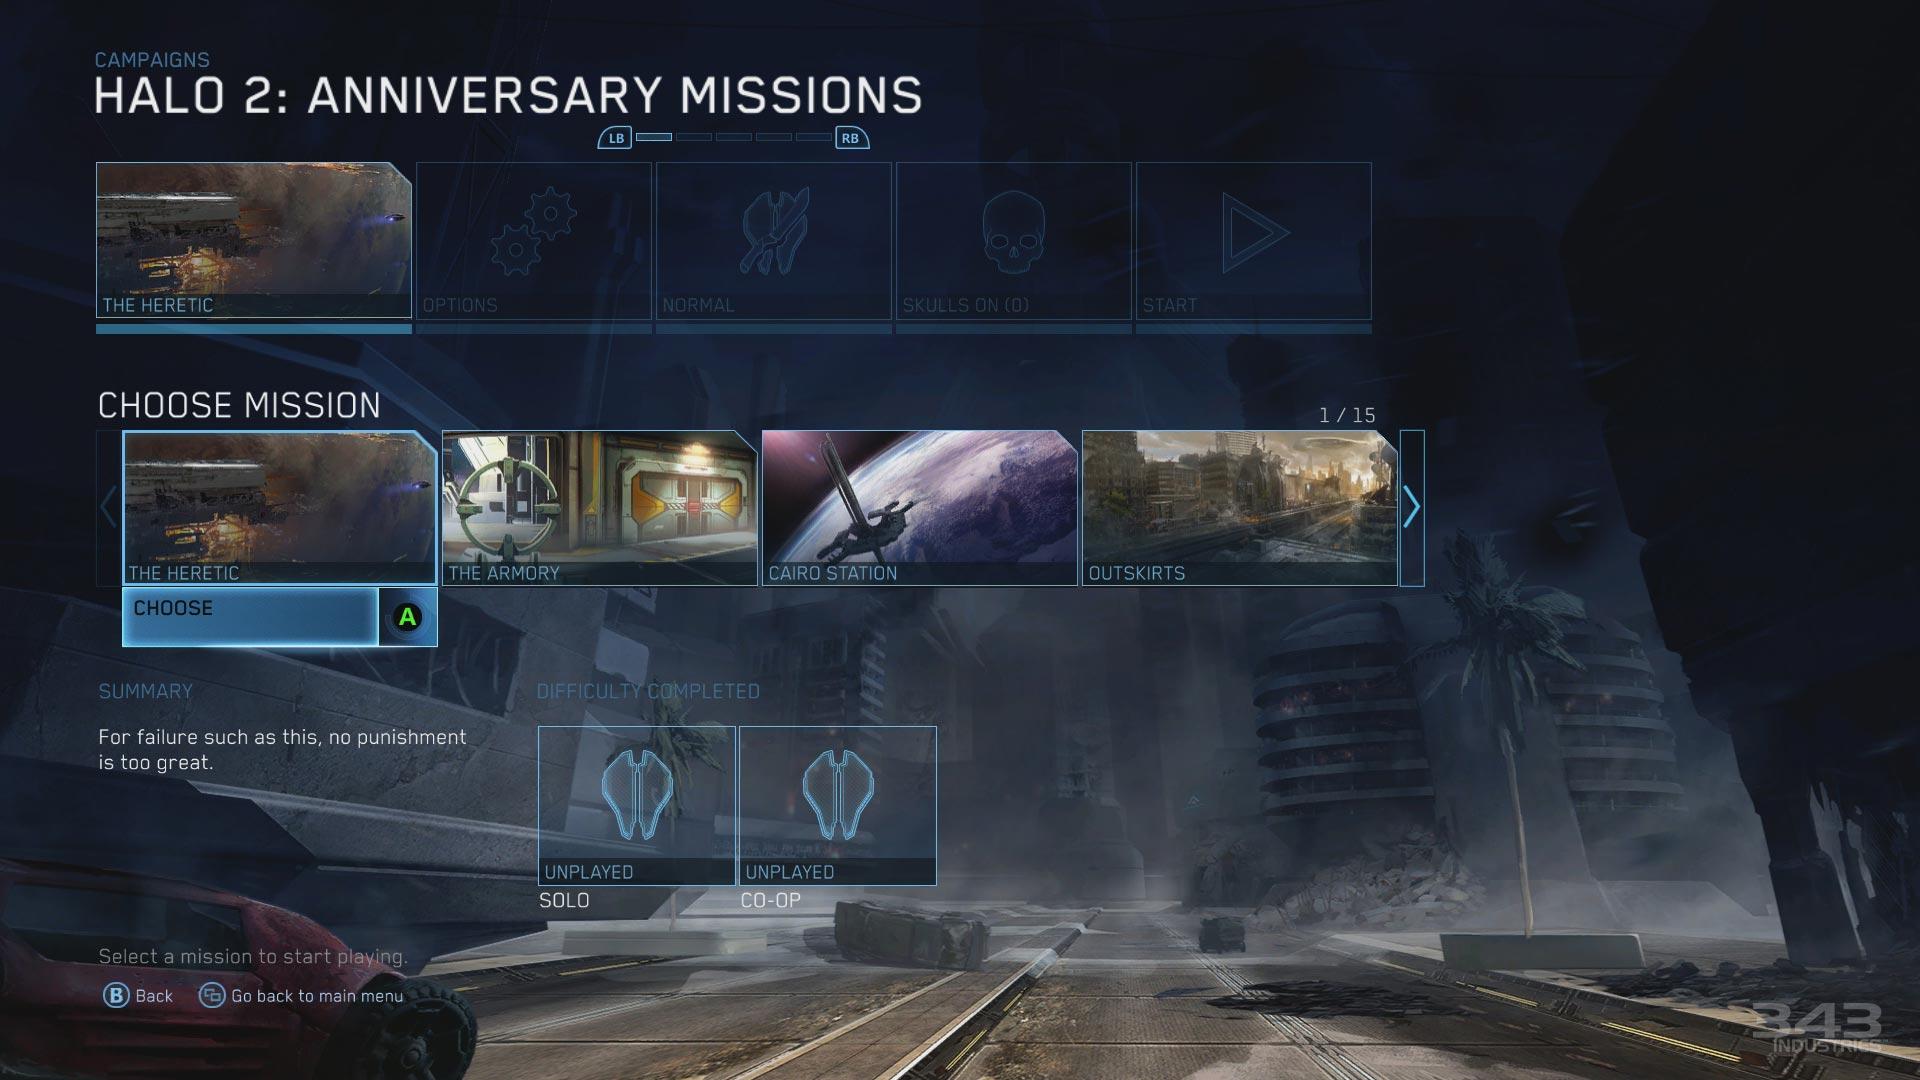 E3 2014: Halo Master Chief Collection, Halo 5 Beta, & Halo 2